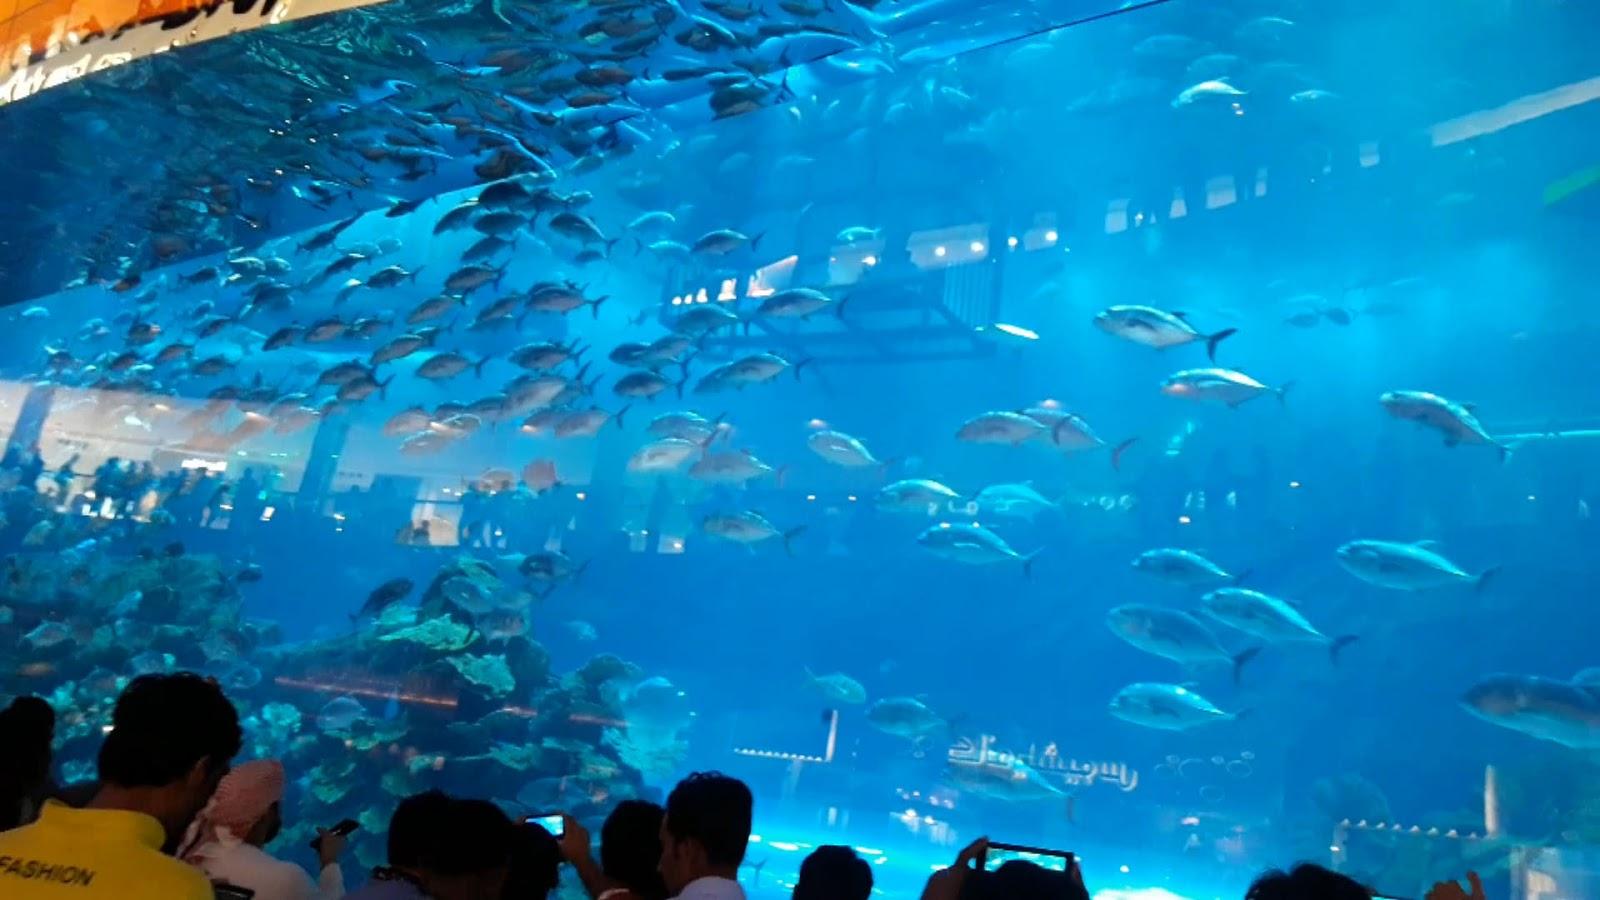 Big aquarium 10-million liters water - ShareTV (Sharing the